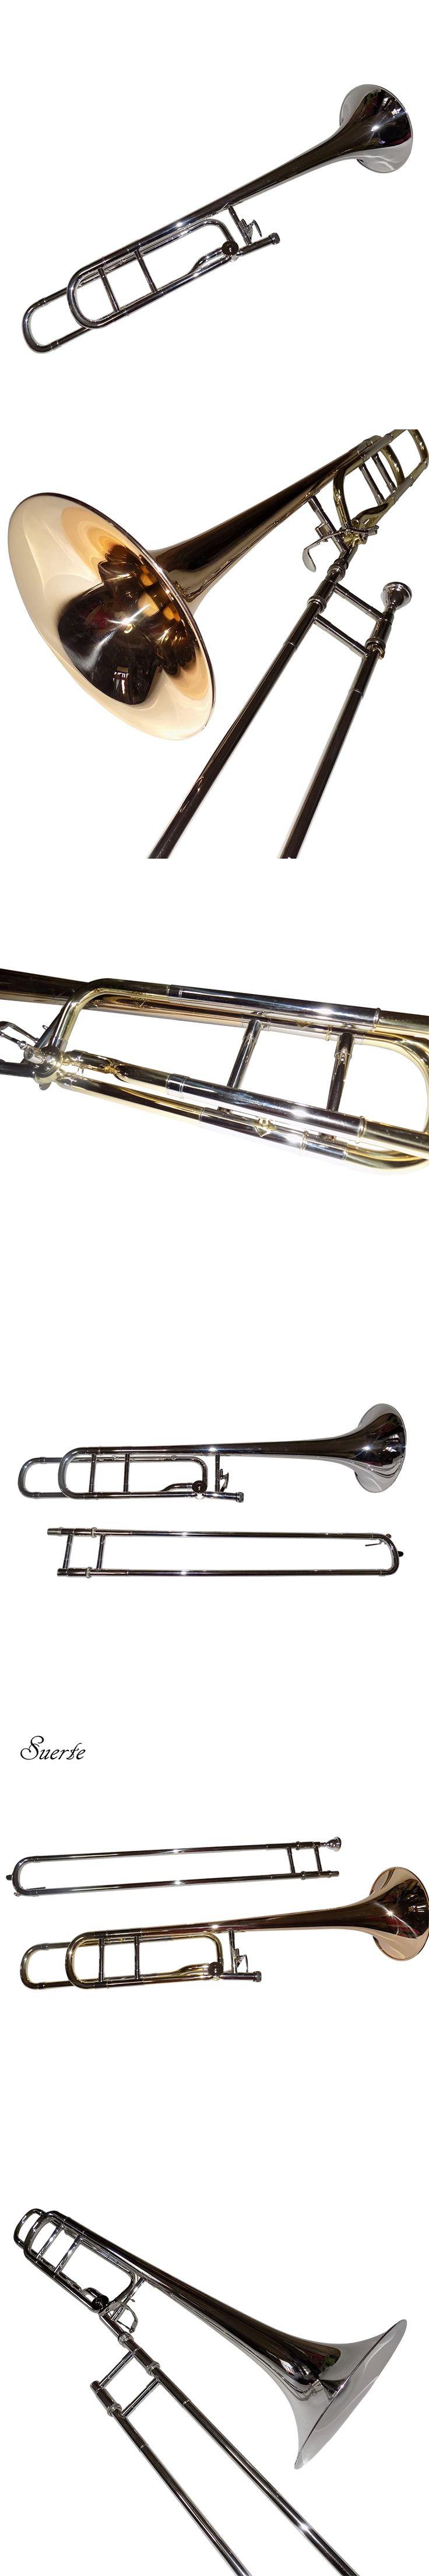 Professional Bb/F Tenor trombones Brass Body with Foambody case musical instruments online shop